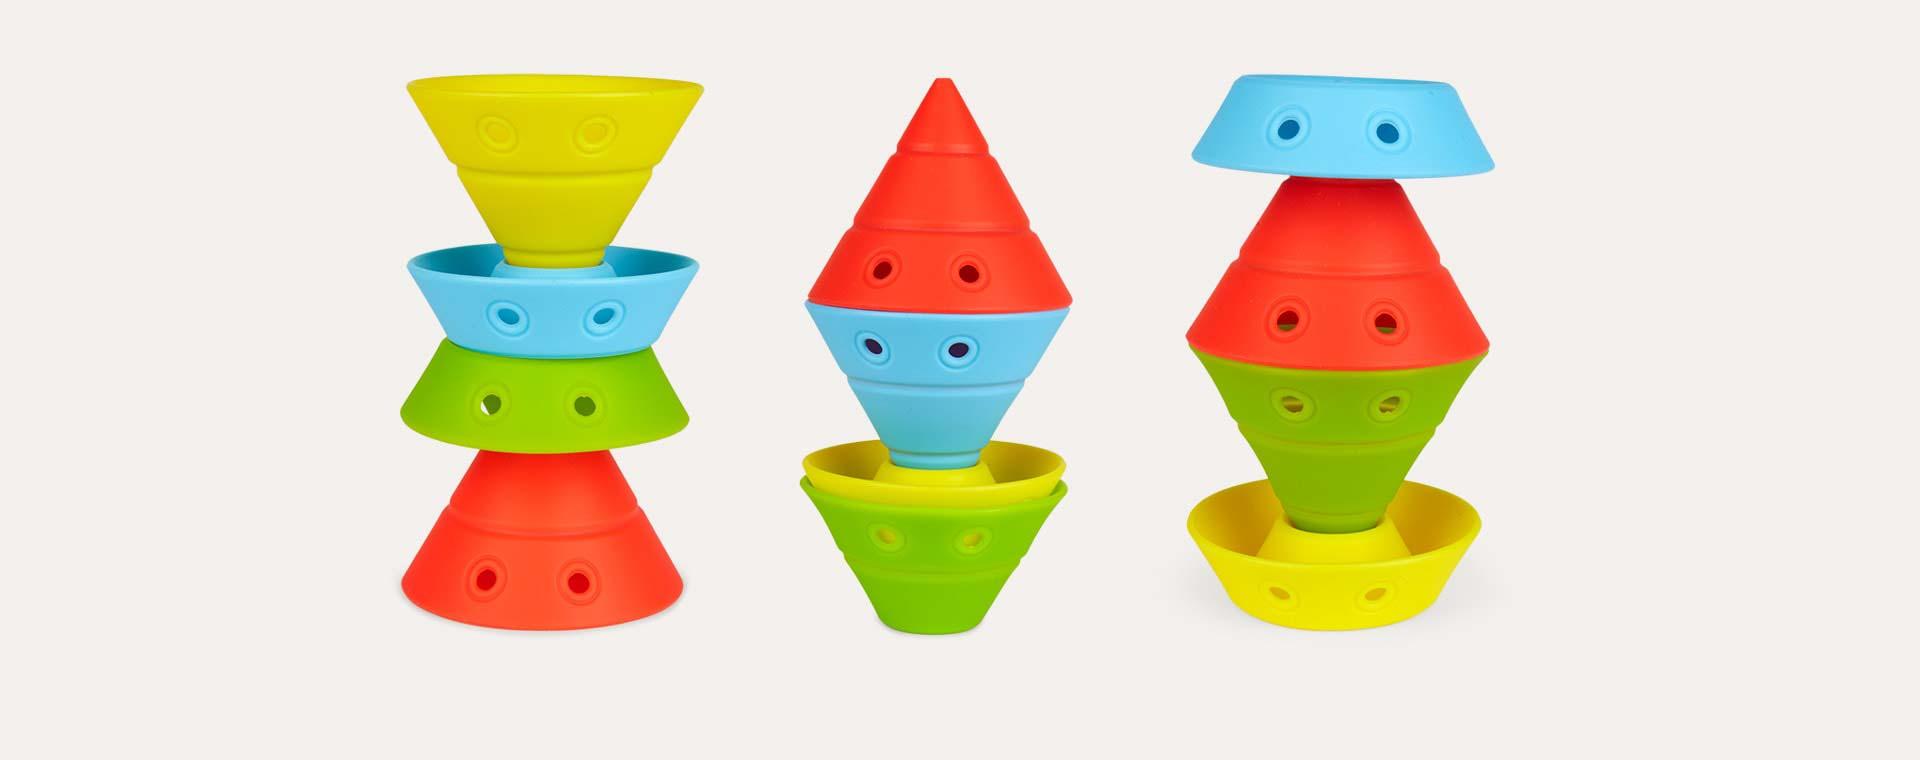 moluk-hix-construction-cones-multi-1920x760_v1_04